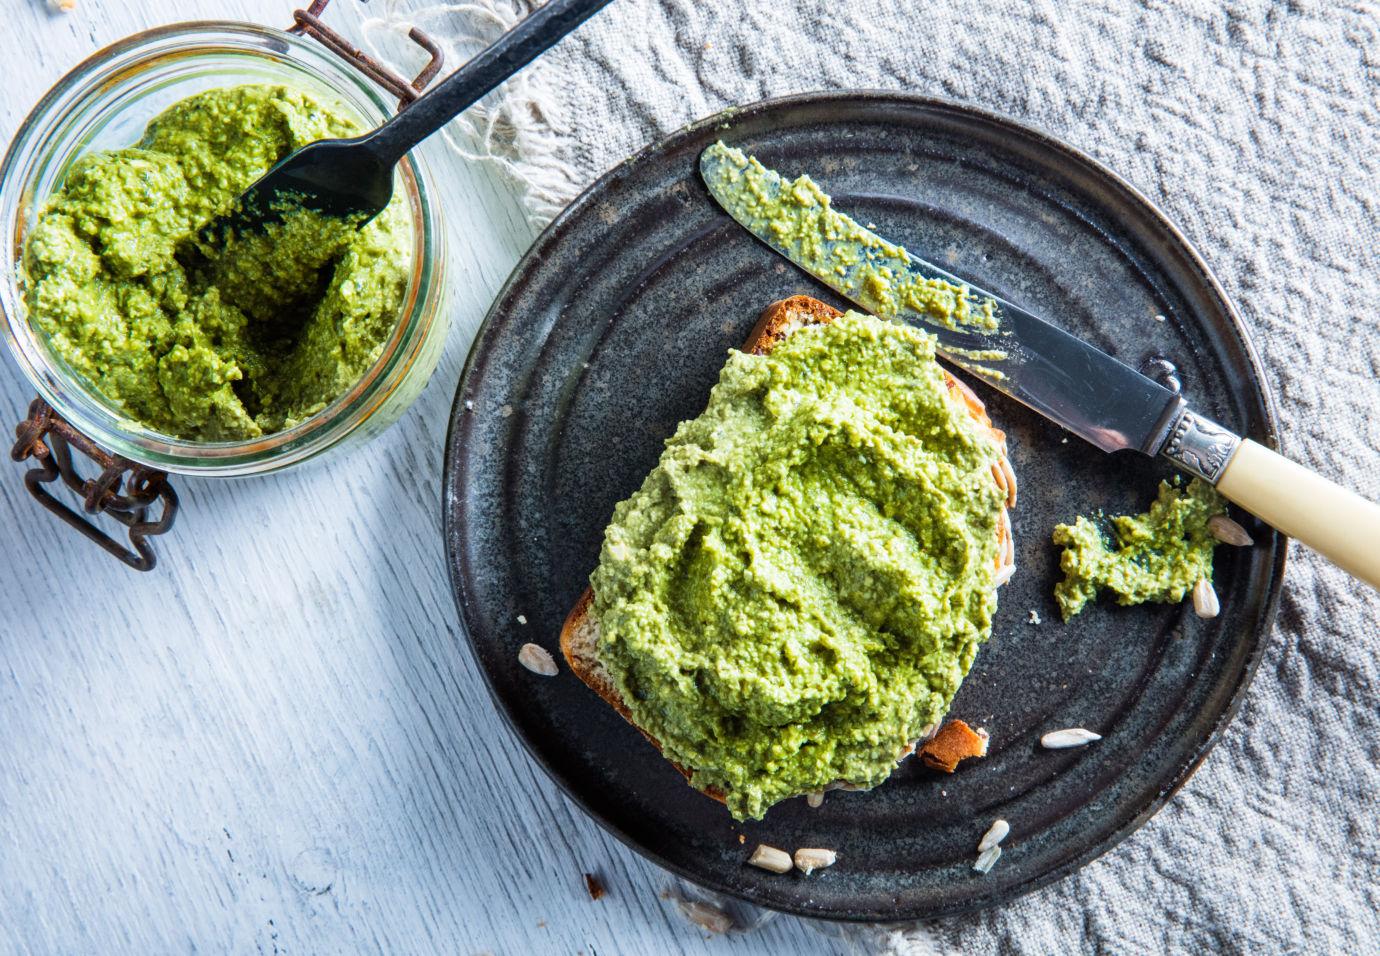 Sofie Dumont - Spread pompoenpitten en avocado